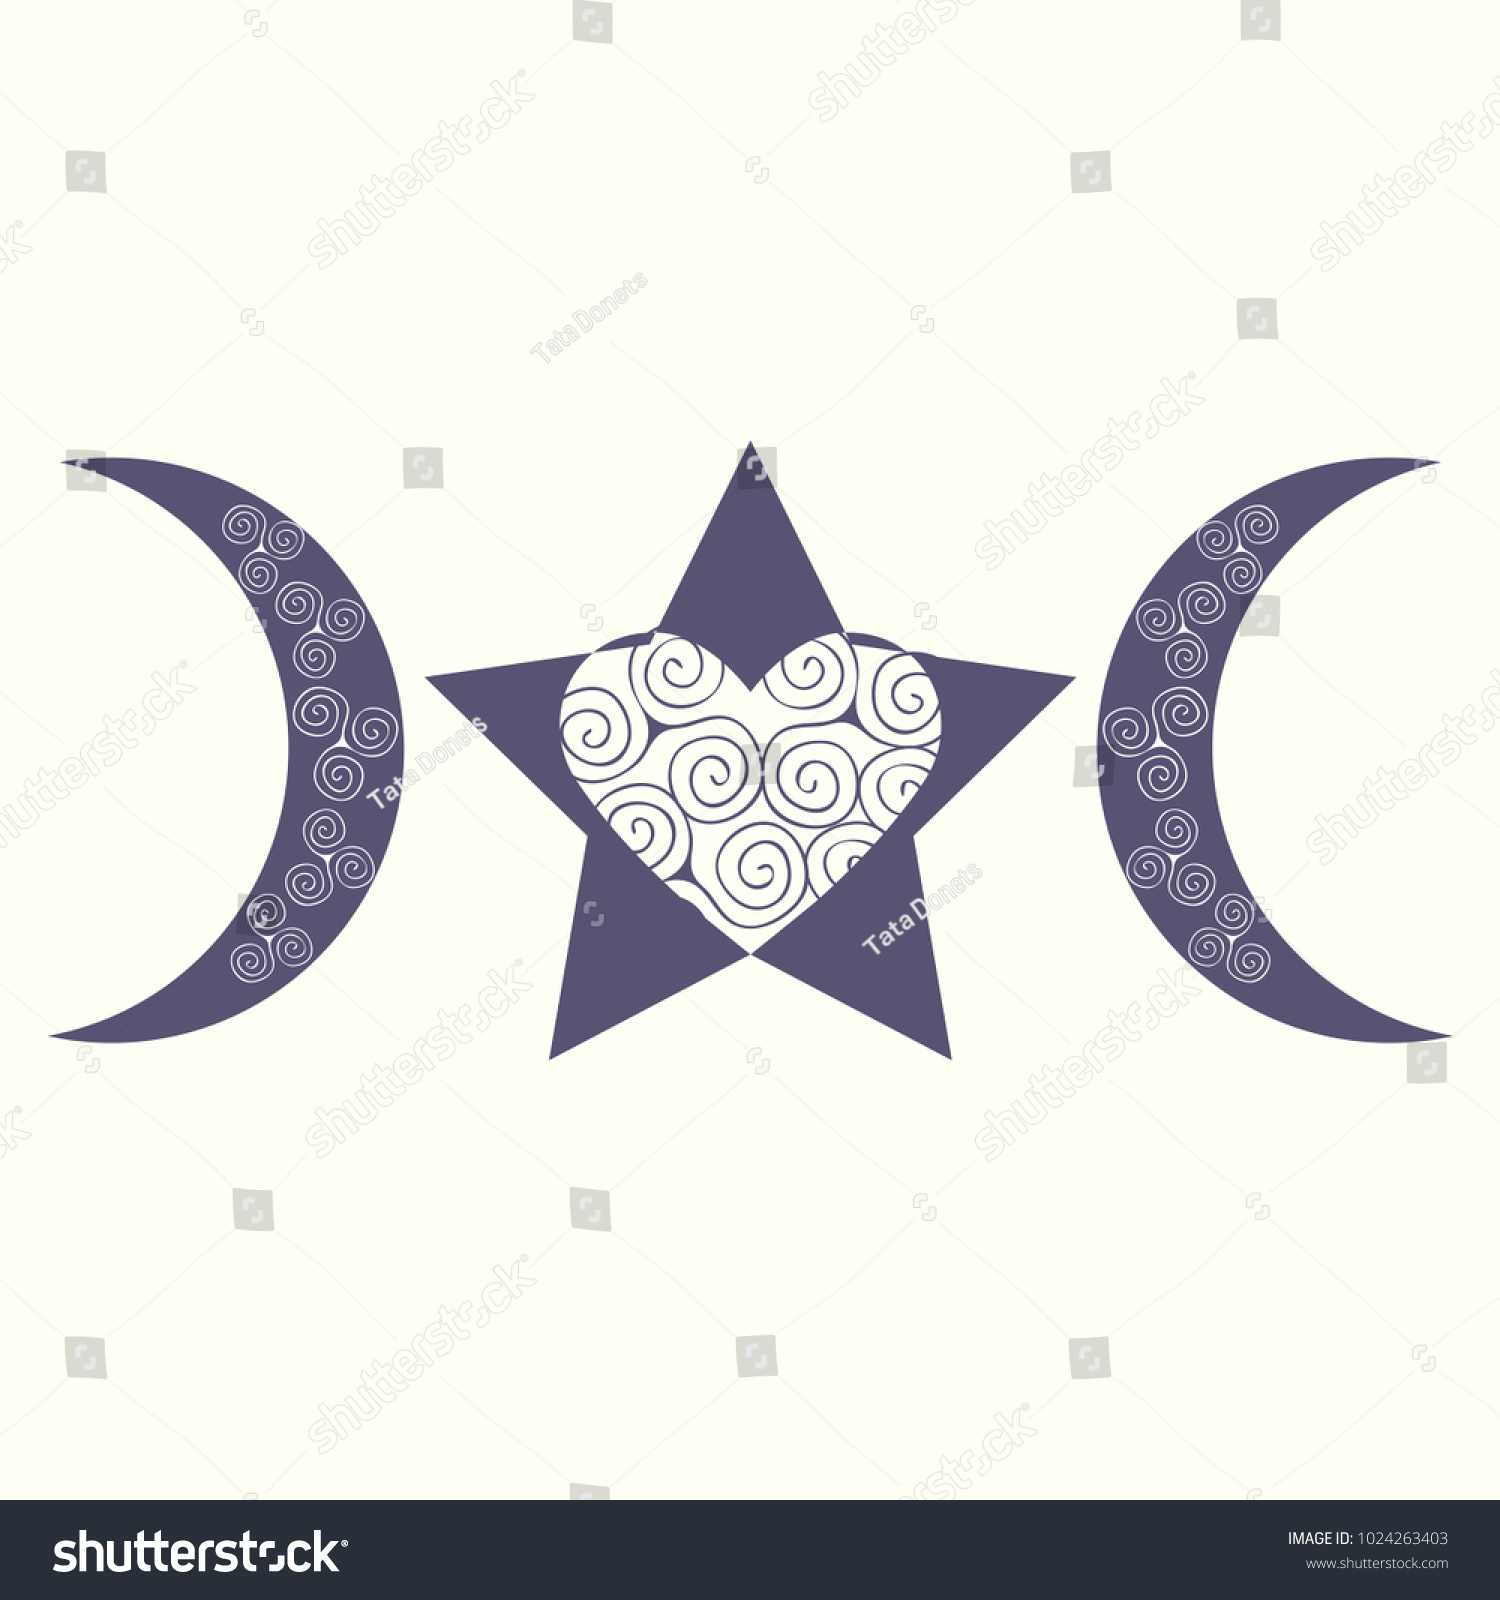 Modern Variant Spiral Triple Goddess Symbol Stock Vector Hd Royalty